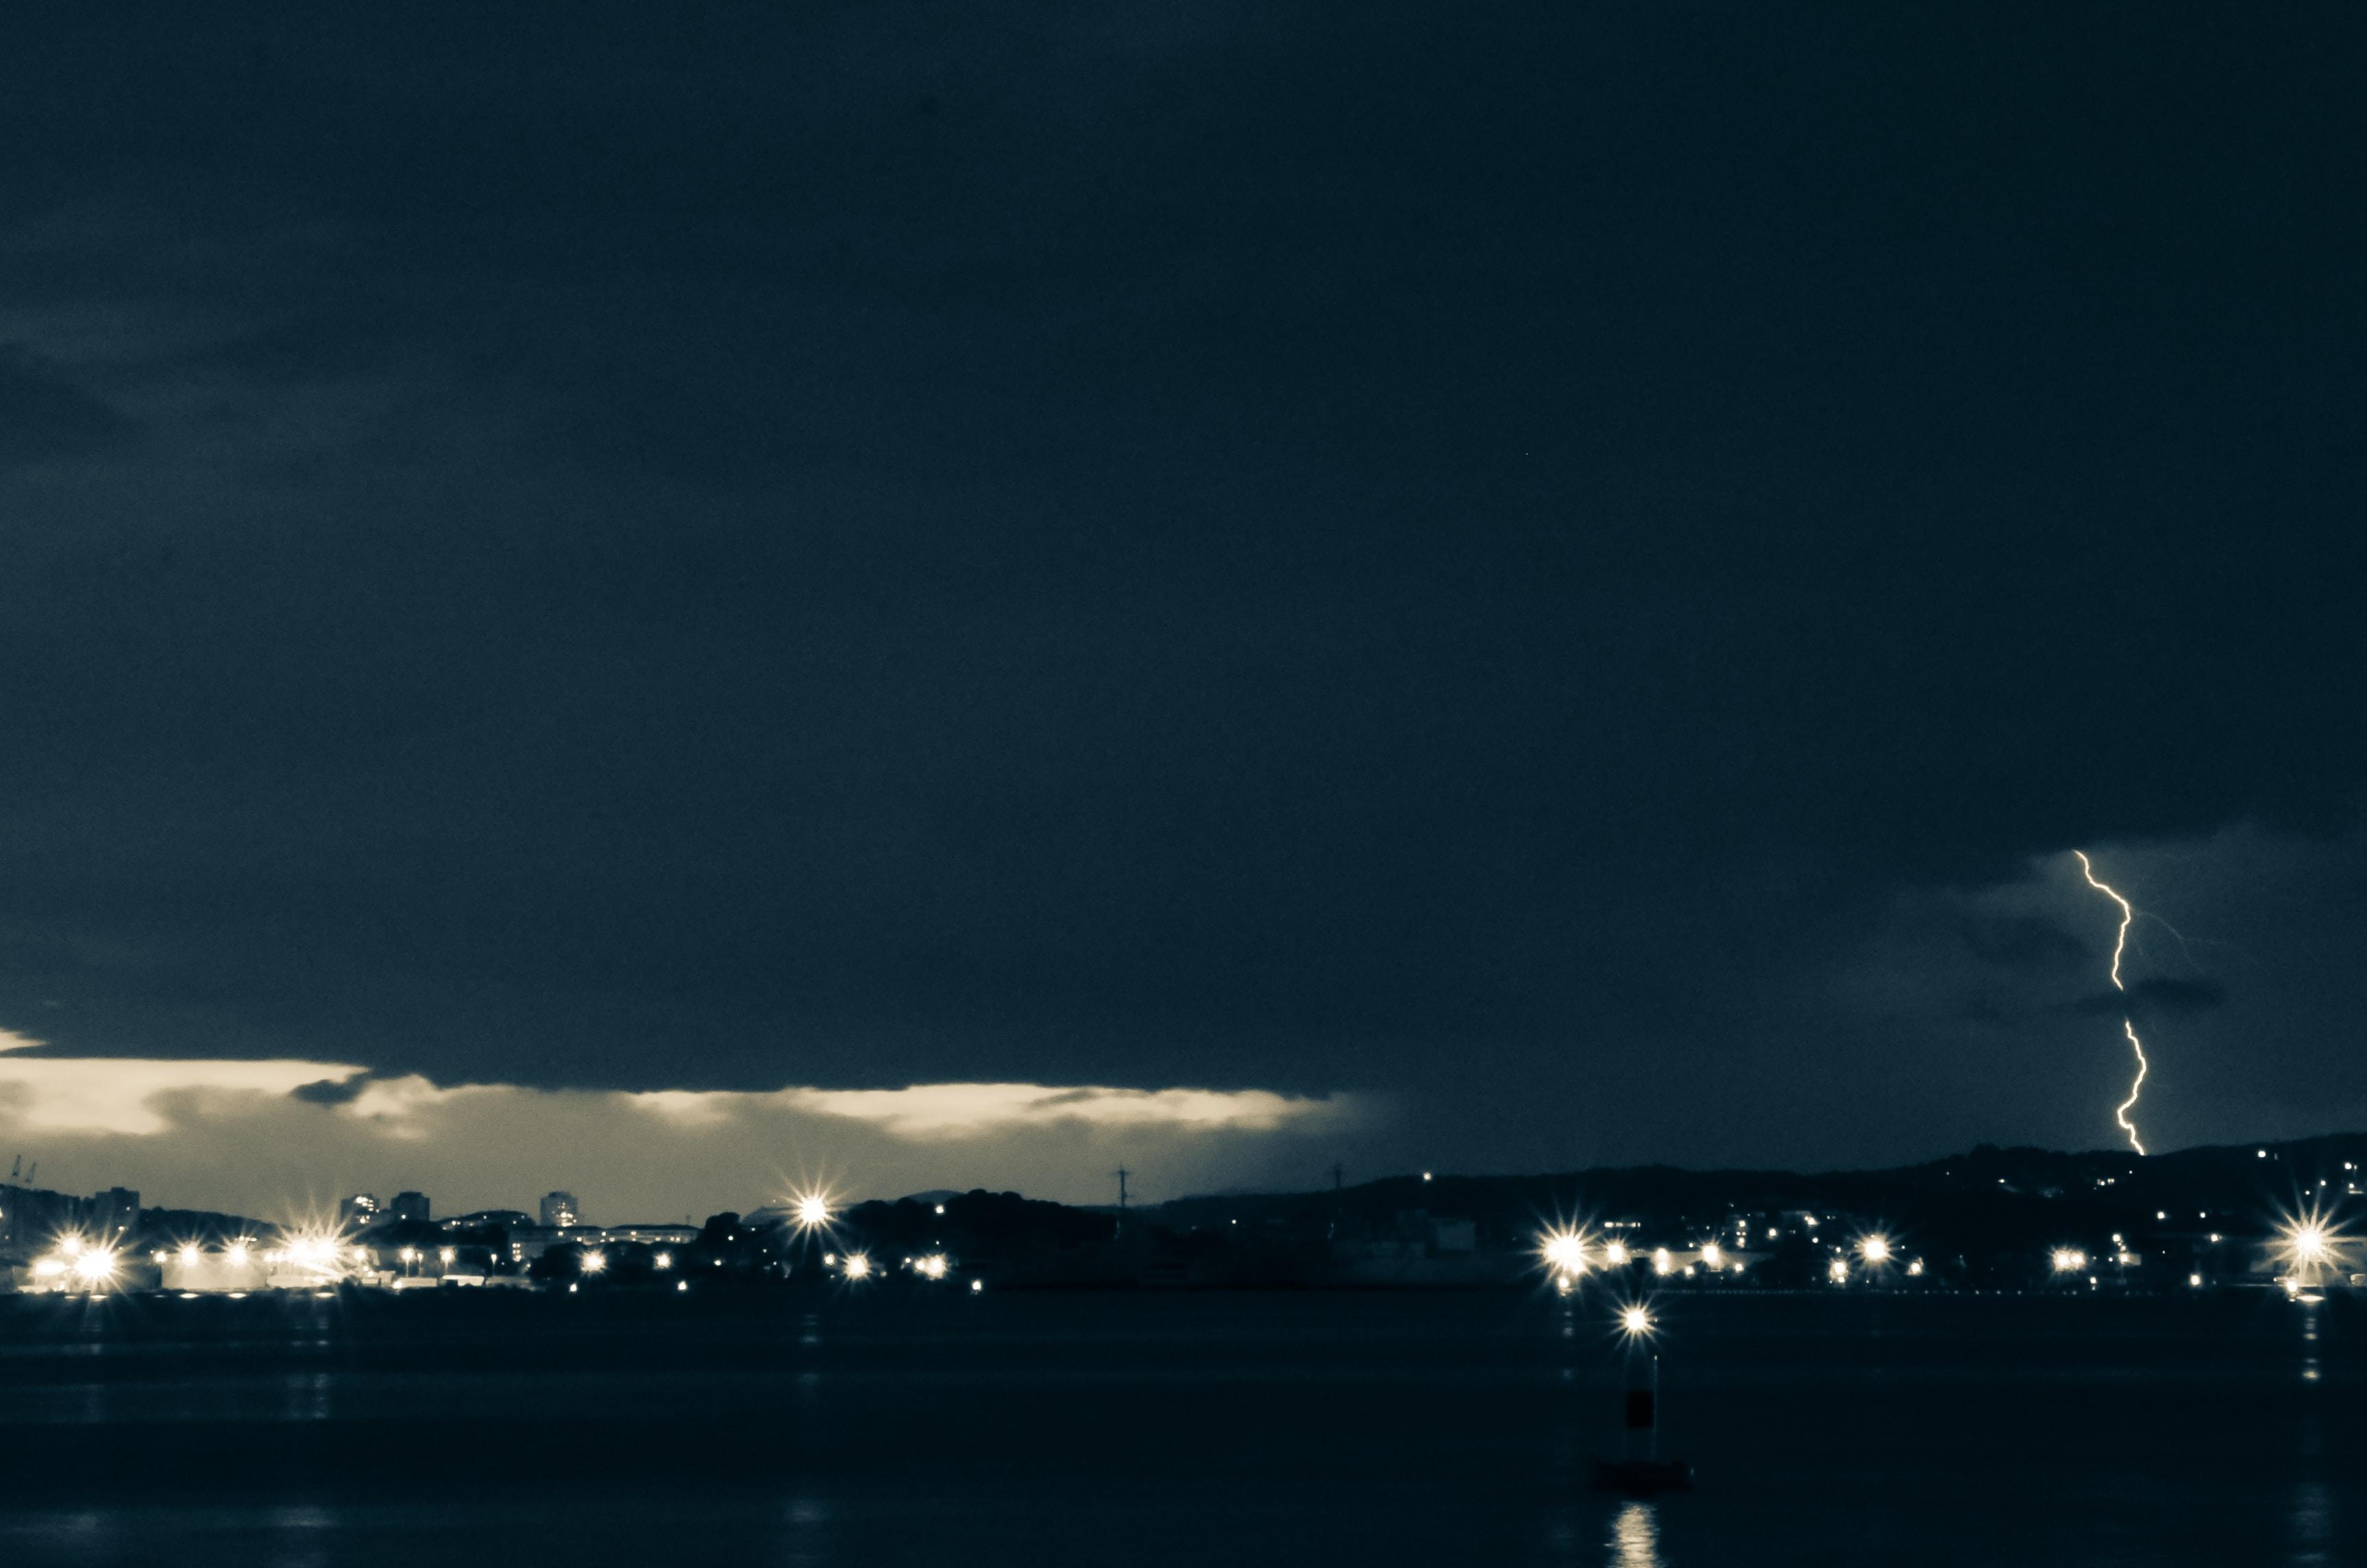 lightning on city lights